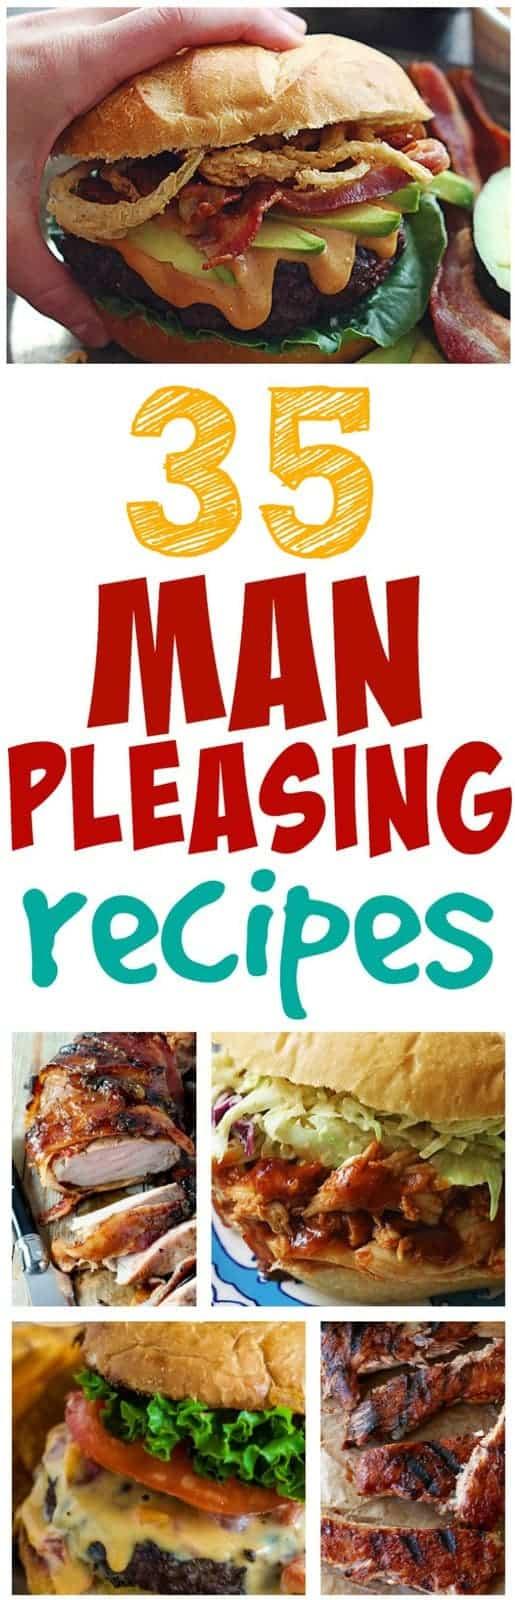 35 Man Pleasing Recipes!